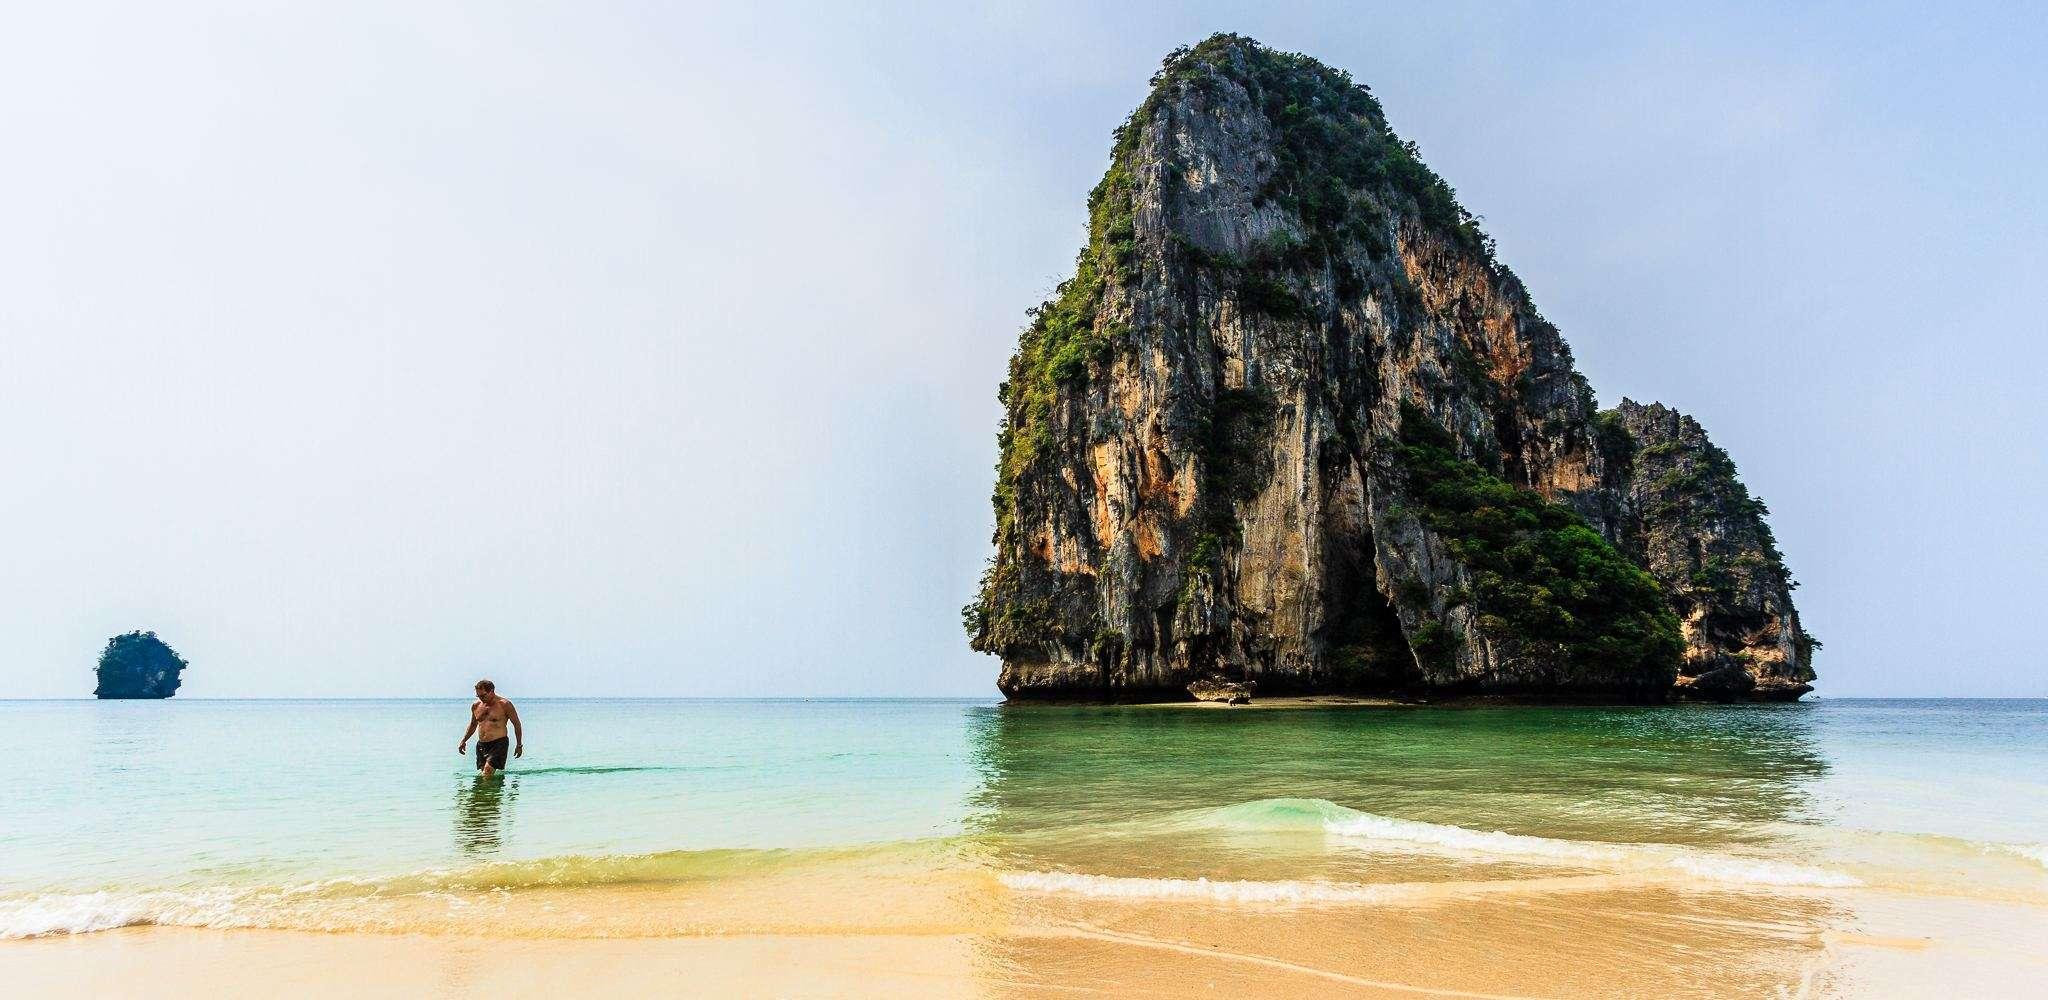 De amazingly rock and landmark on Phra Nang Beach in Railay